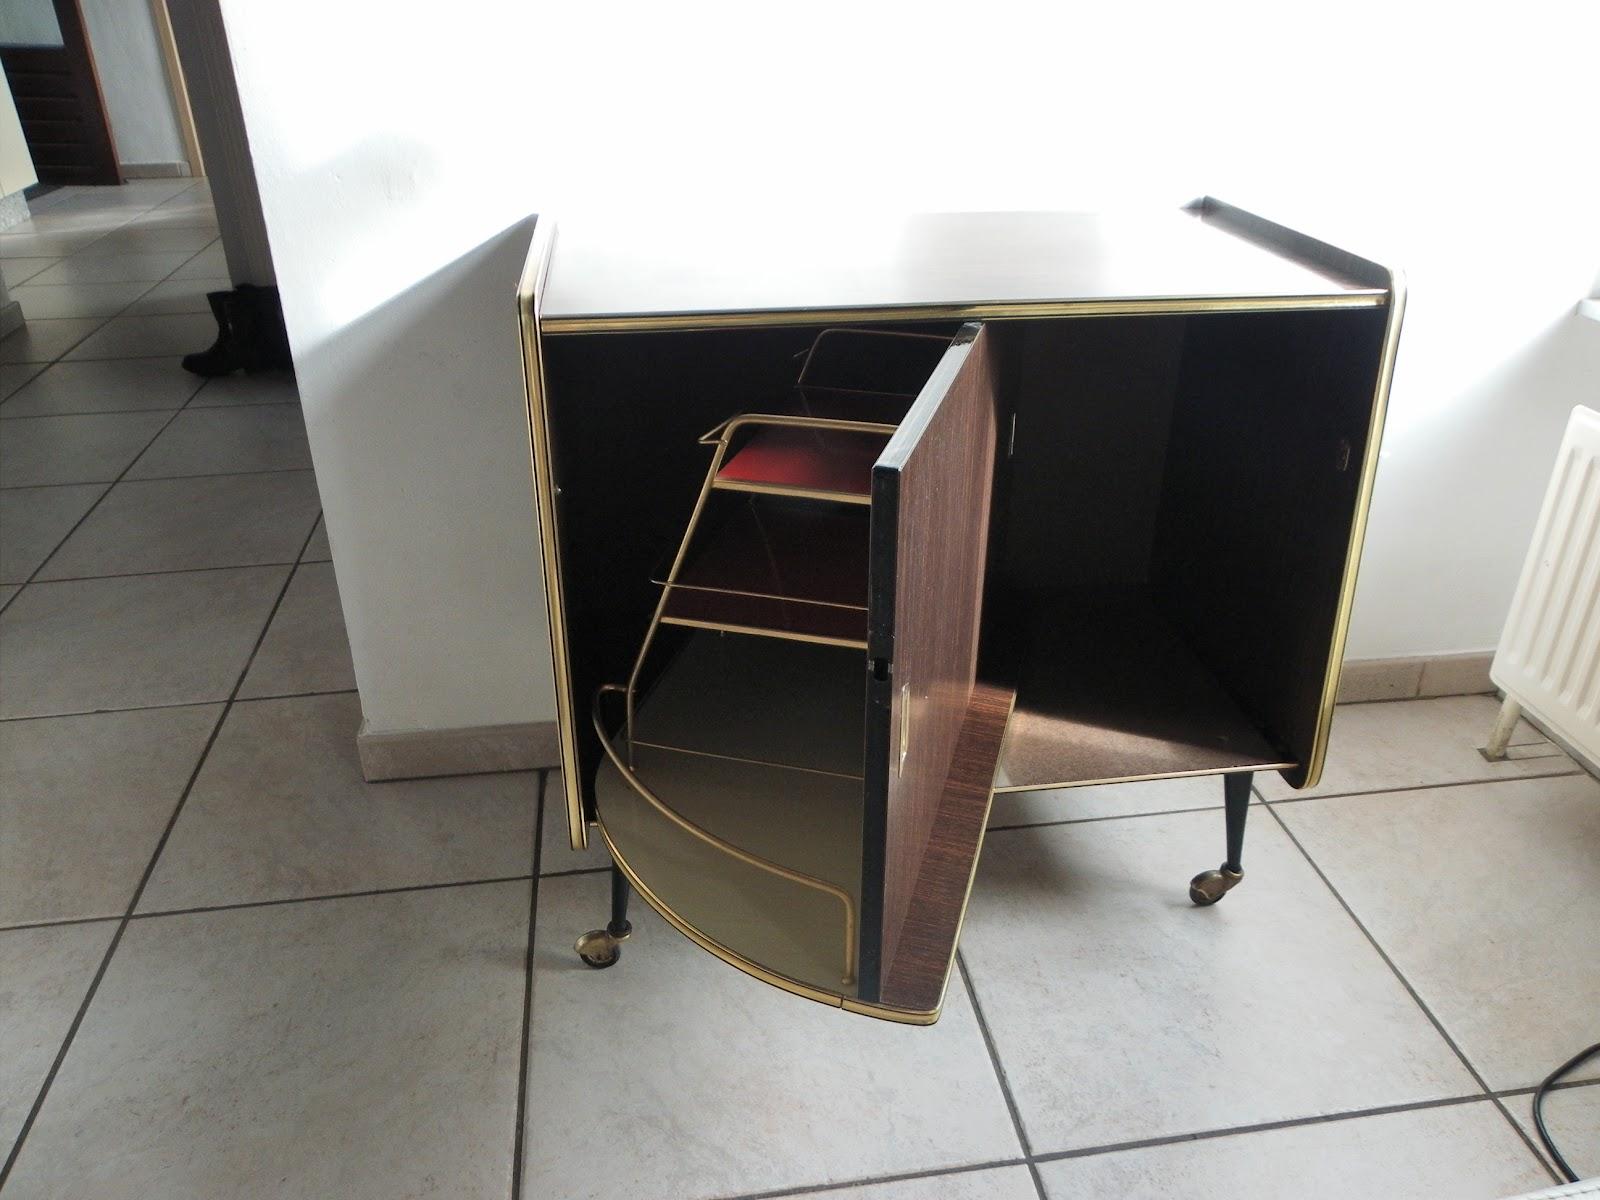 meuble bar en formica des annes roulettes et porte. Black Bedroom Furniture Sets. Home Design Ideas